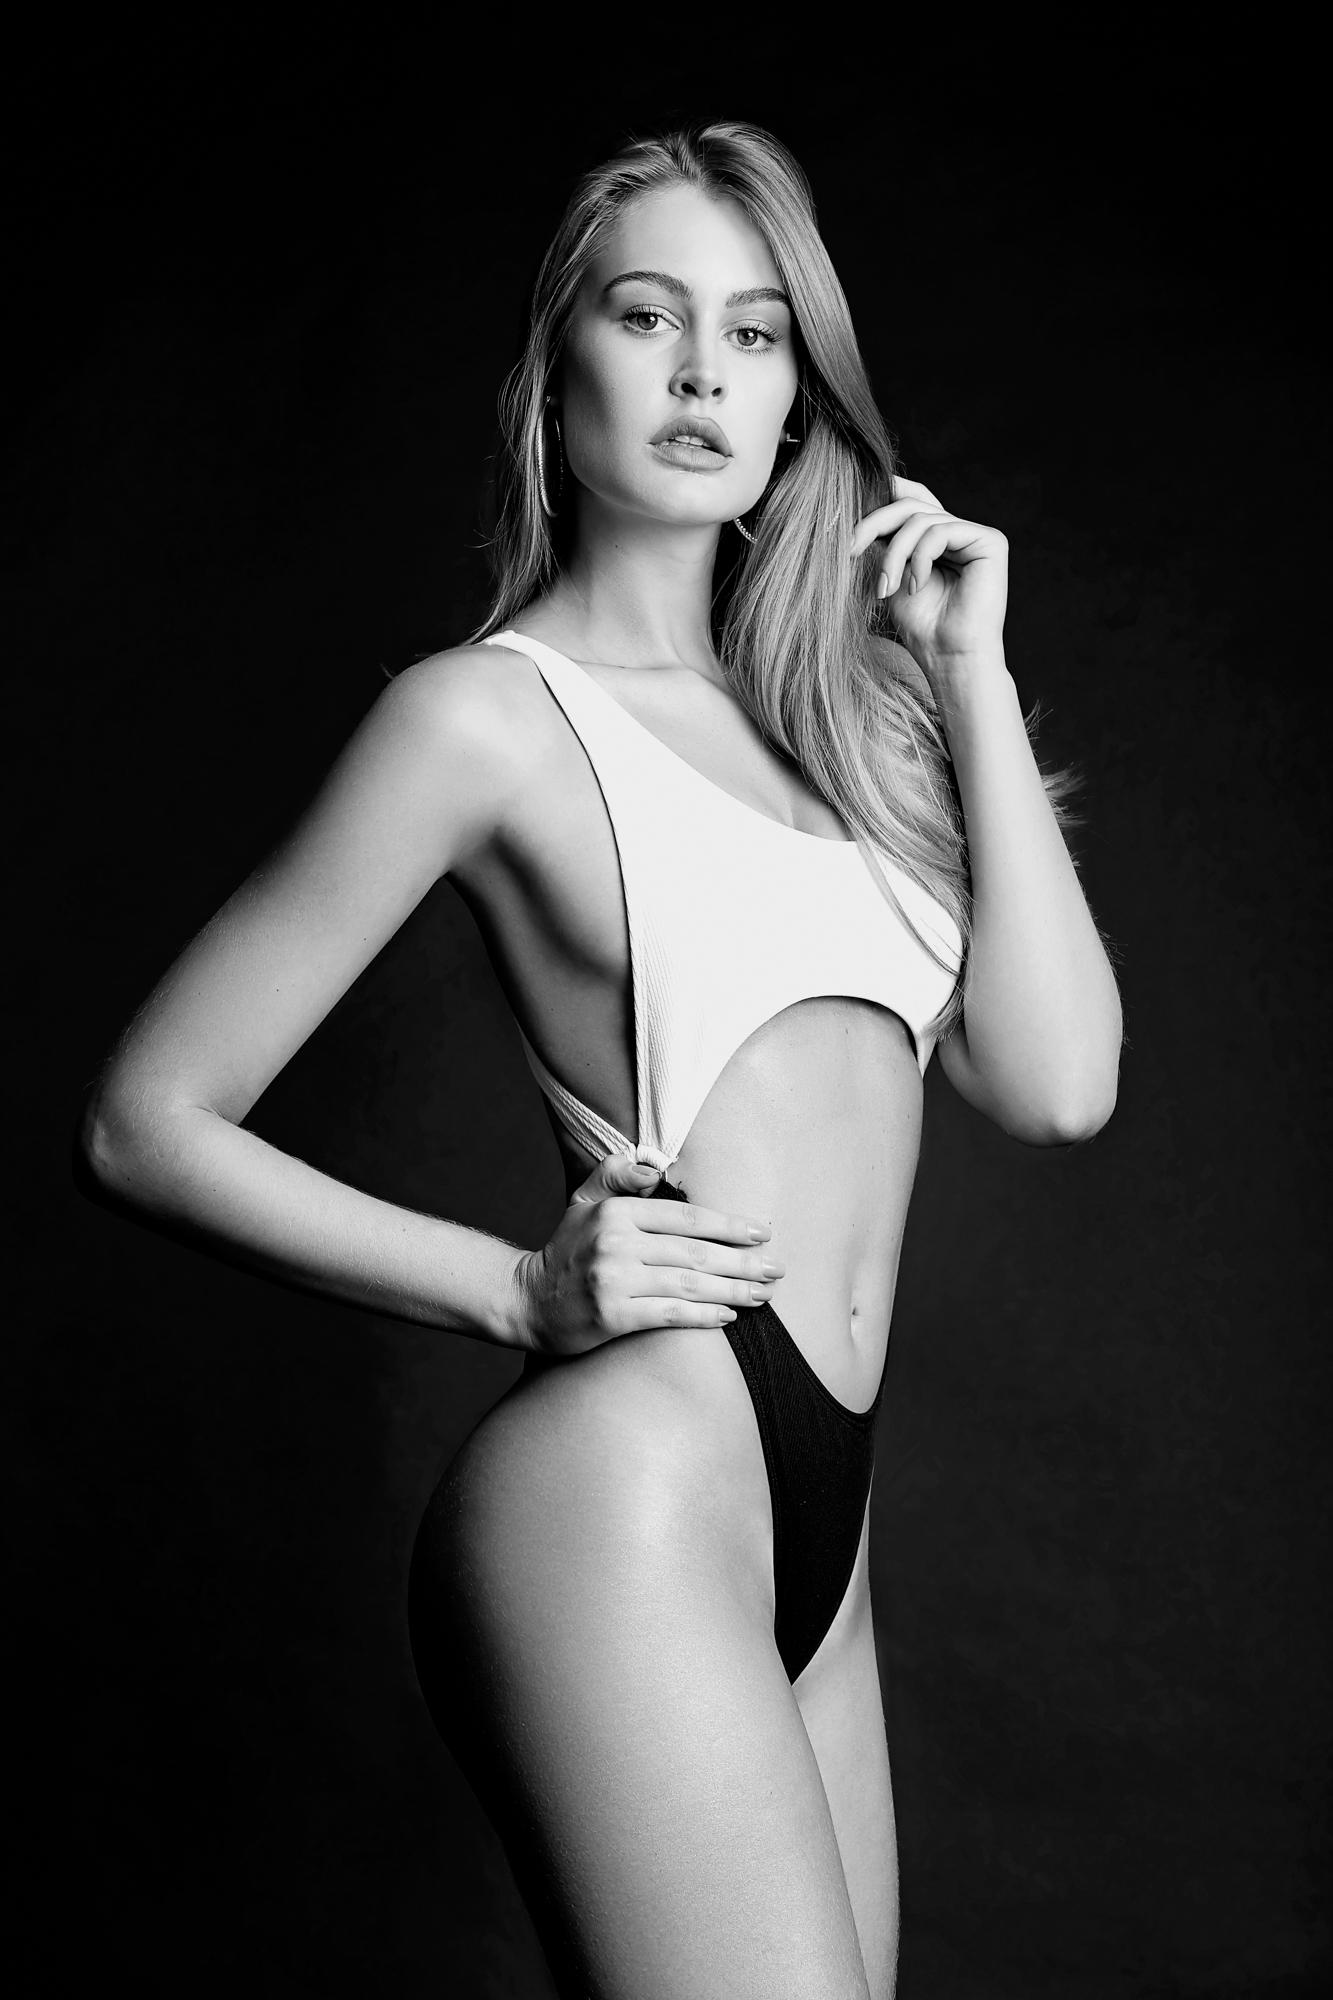 Ingrid Aver